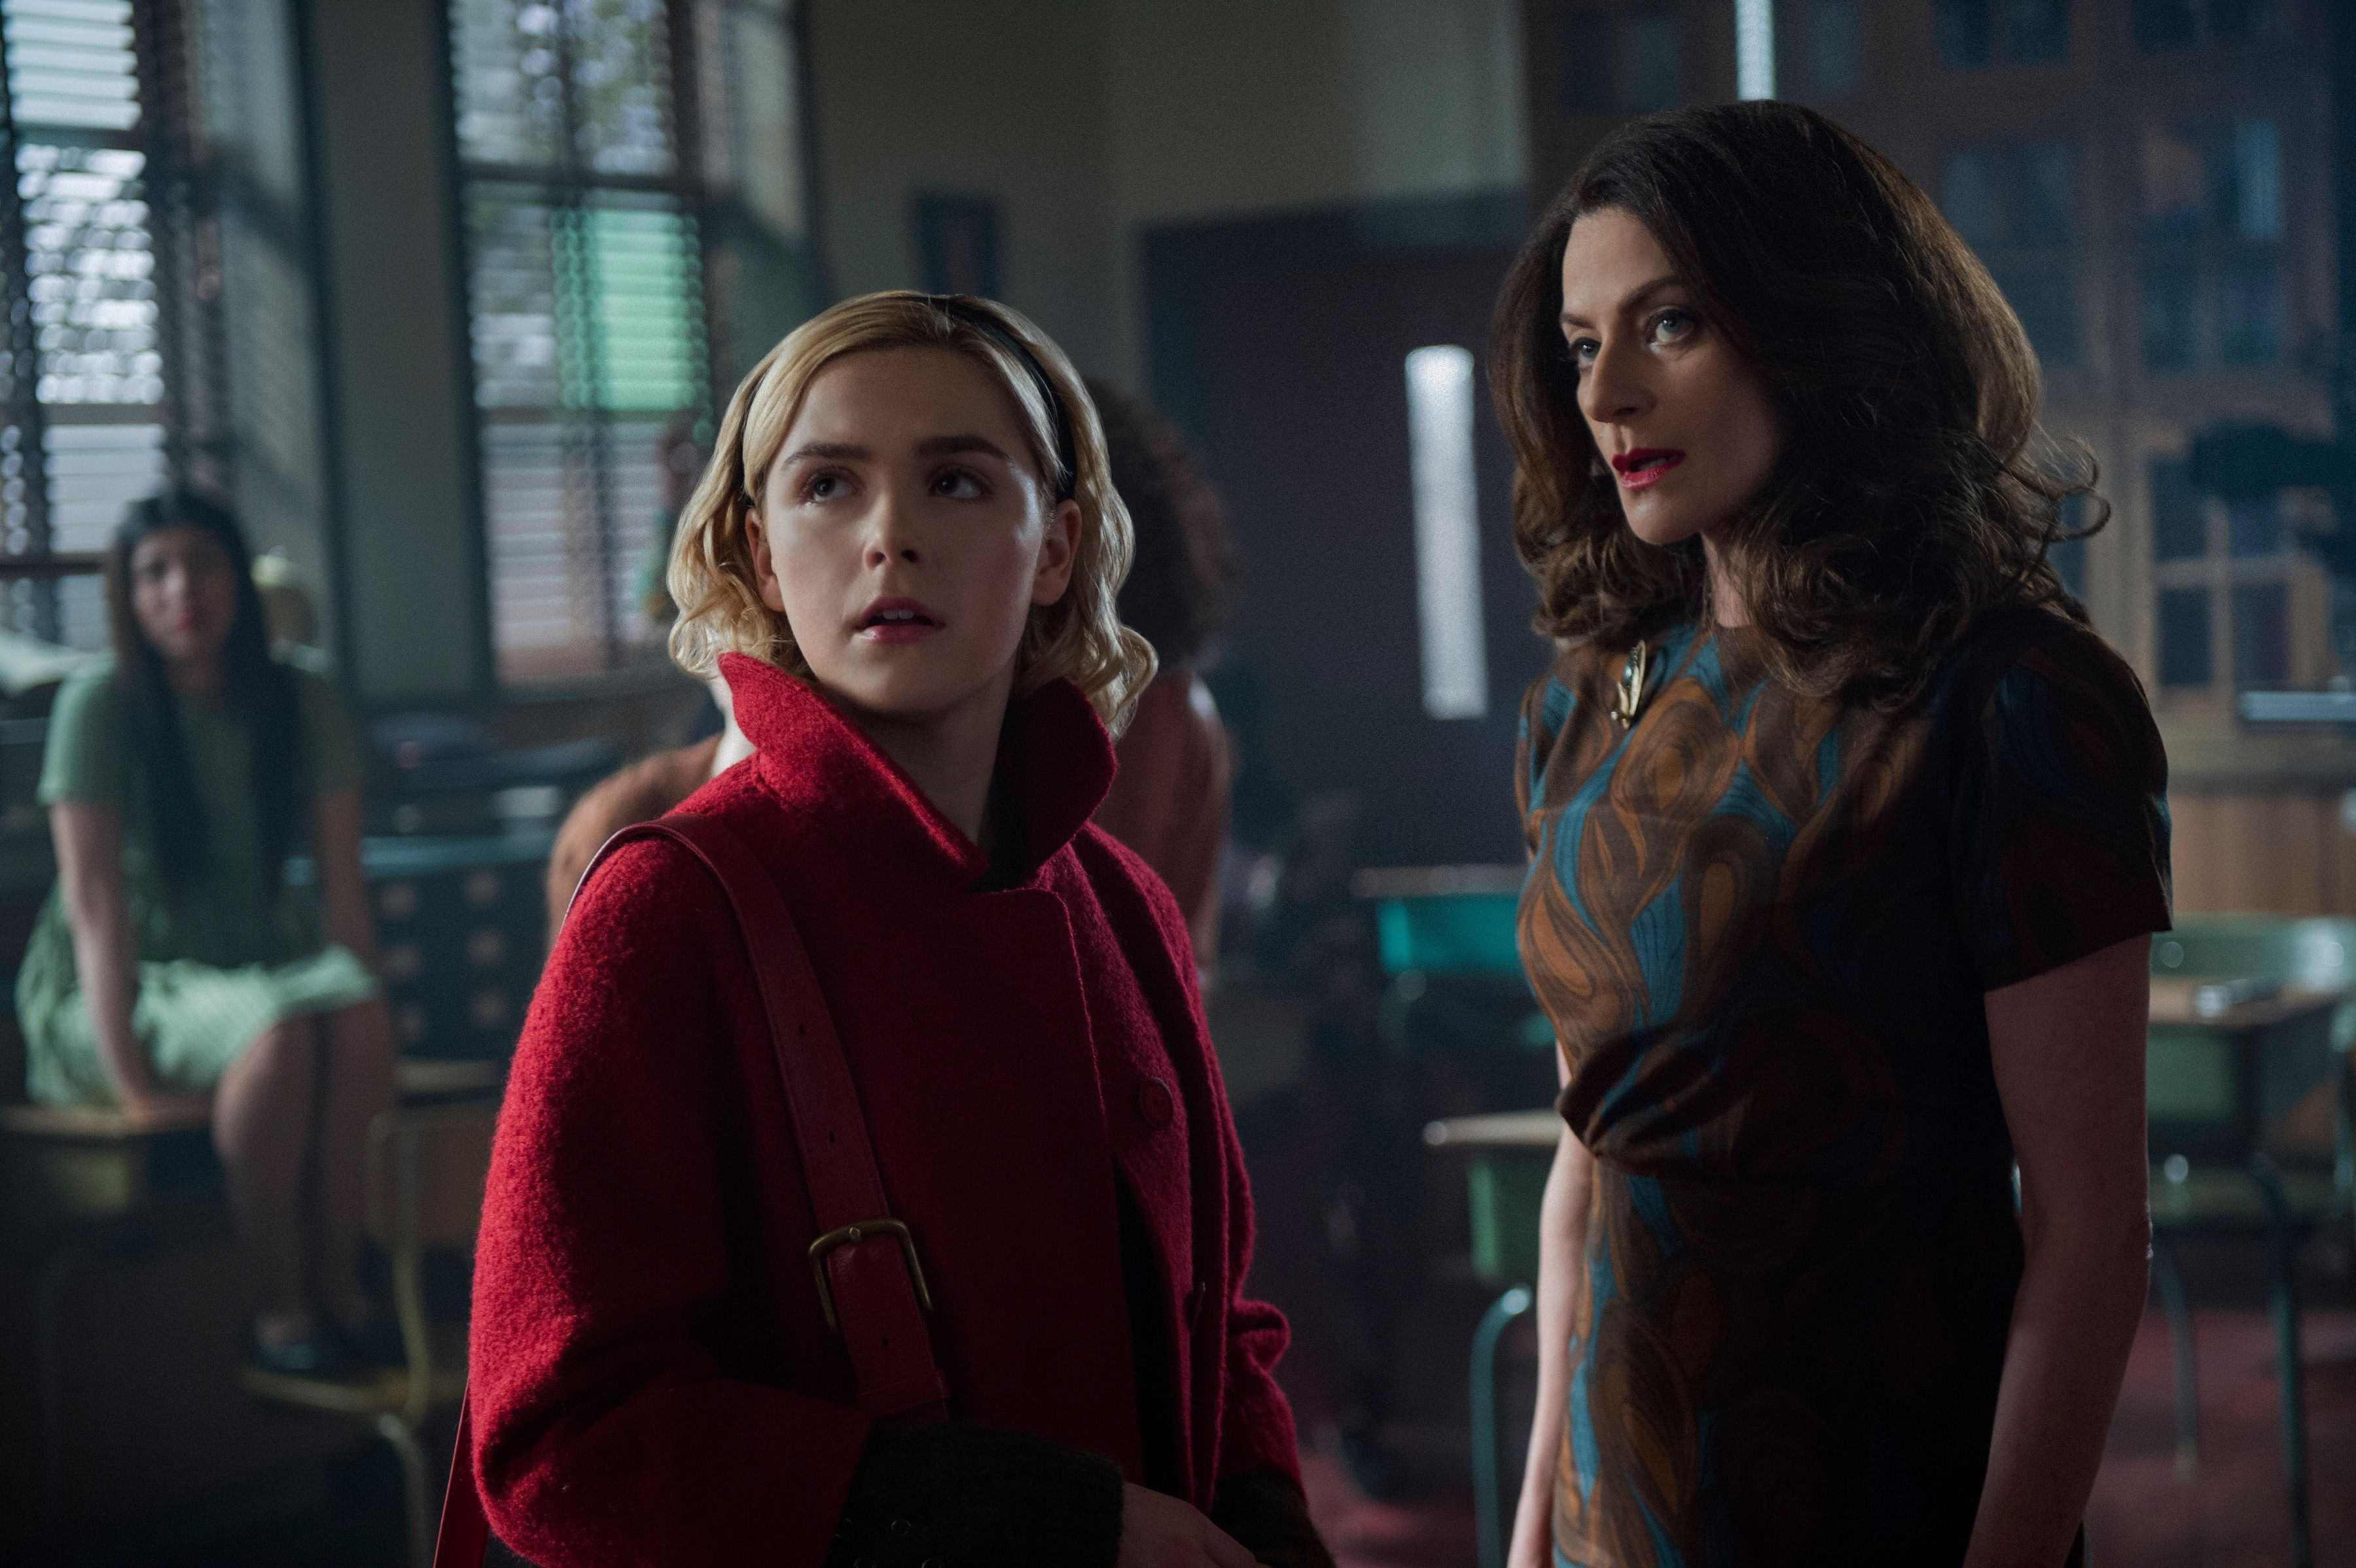 Kiernan Shipka and Michelle Gomez in the Netflix series,